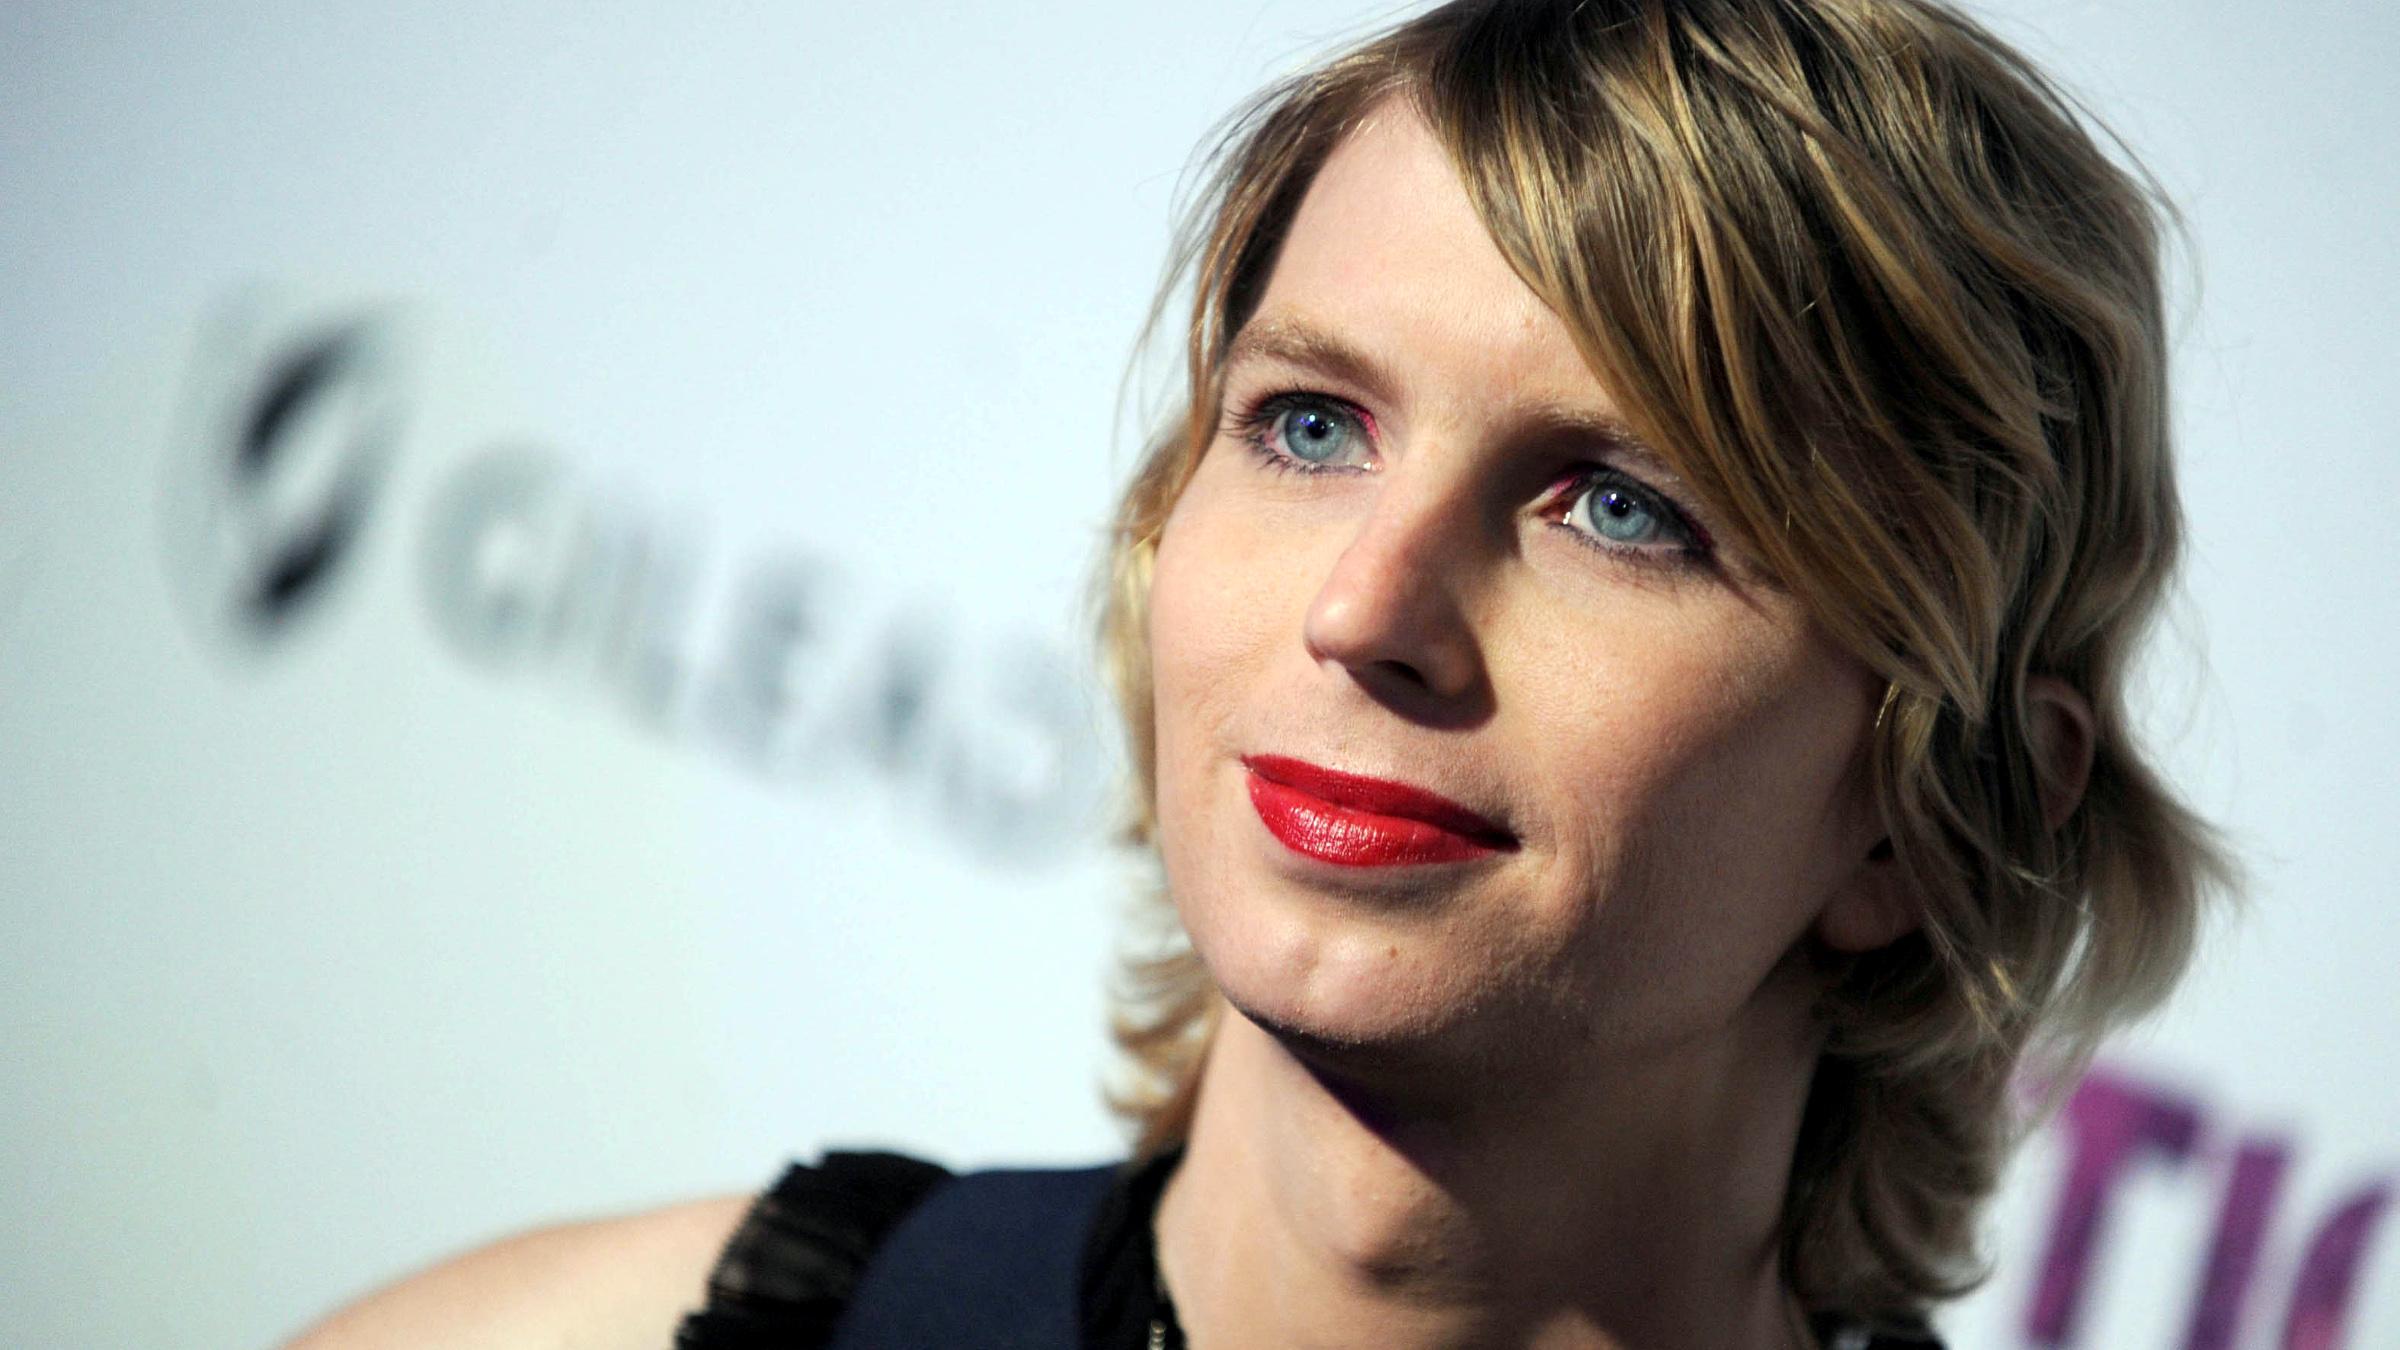 Chelsea Manning: whistleblower, activist...senator?